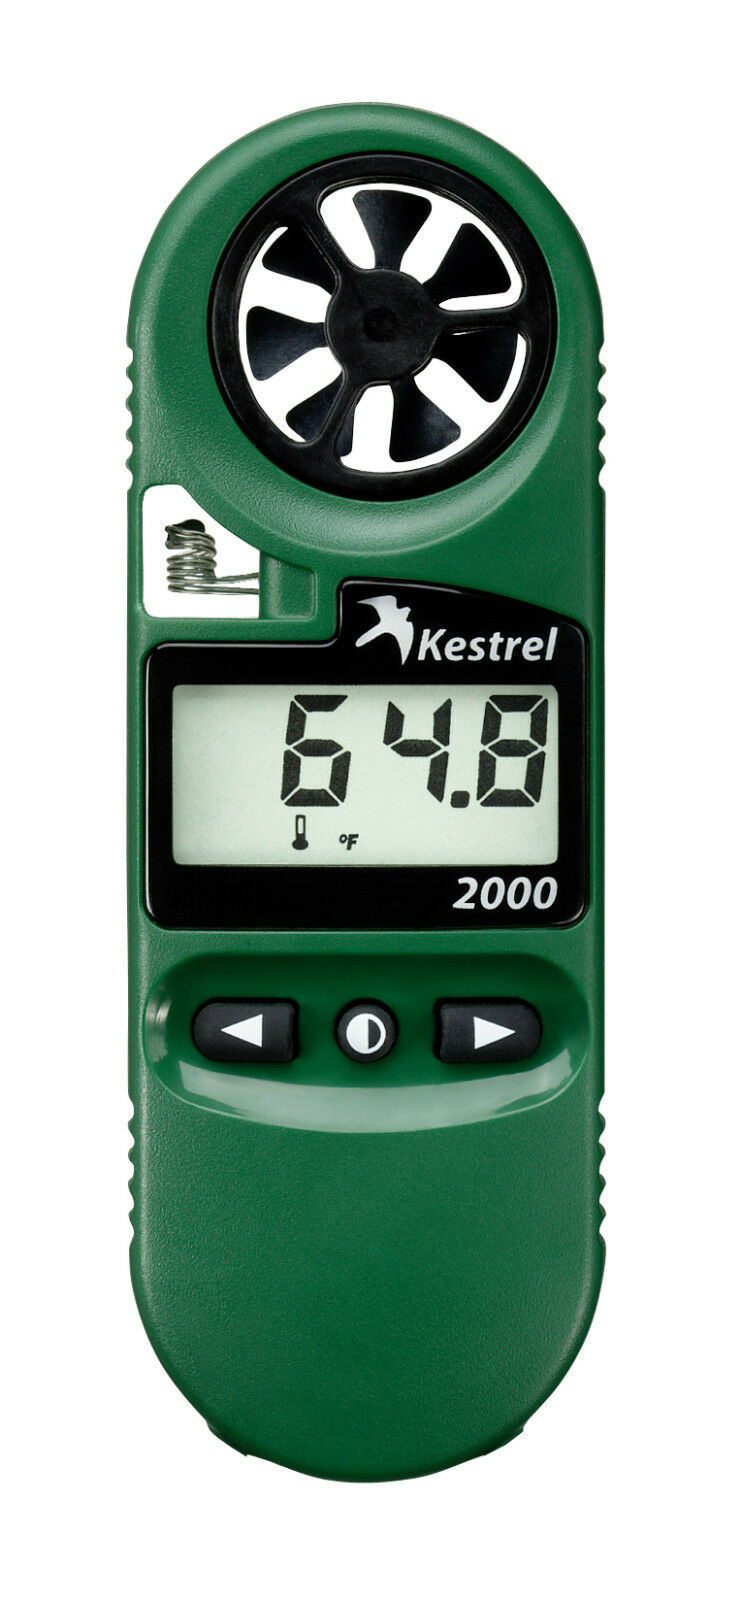 Kestrel 2000 Wind Meter  Air - - - Water - Snow Thermometer 6da41b